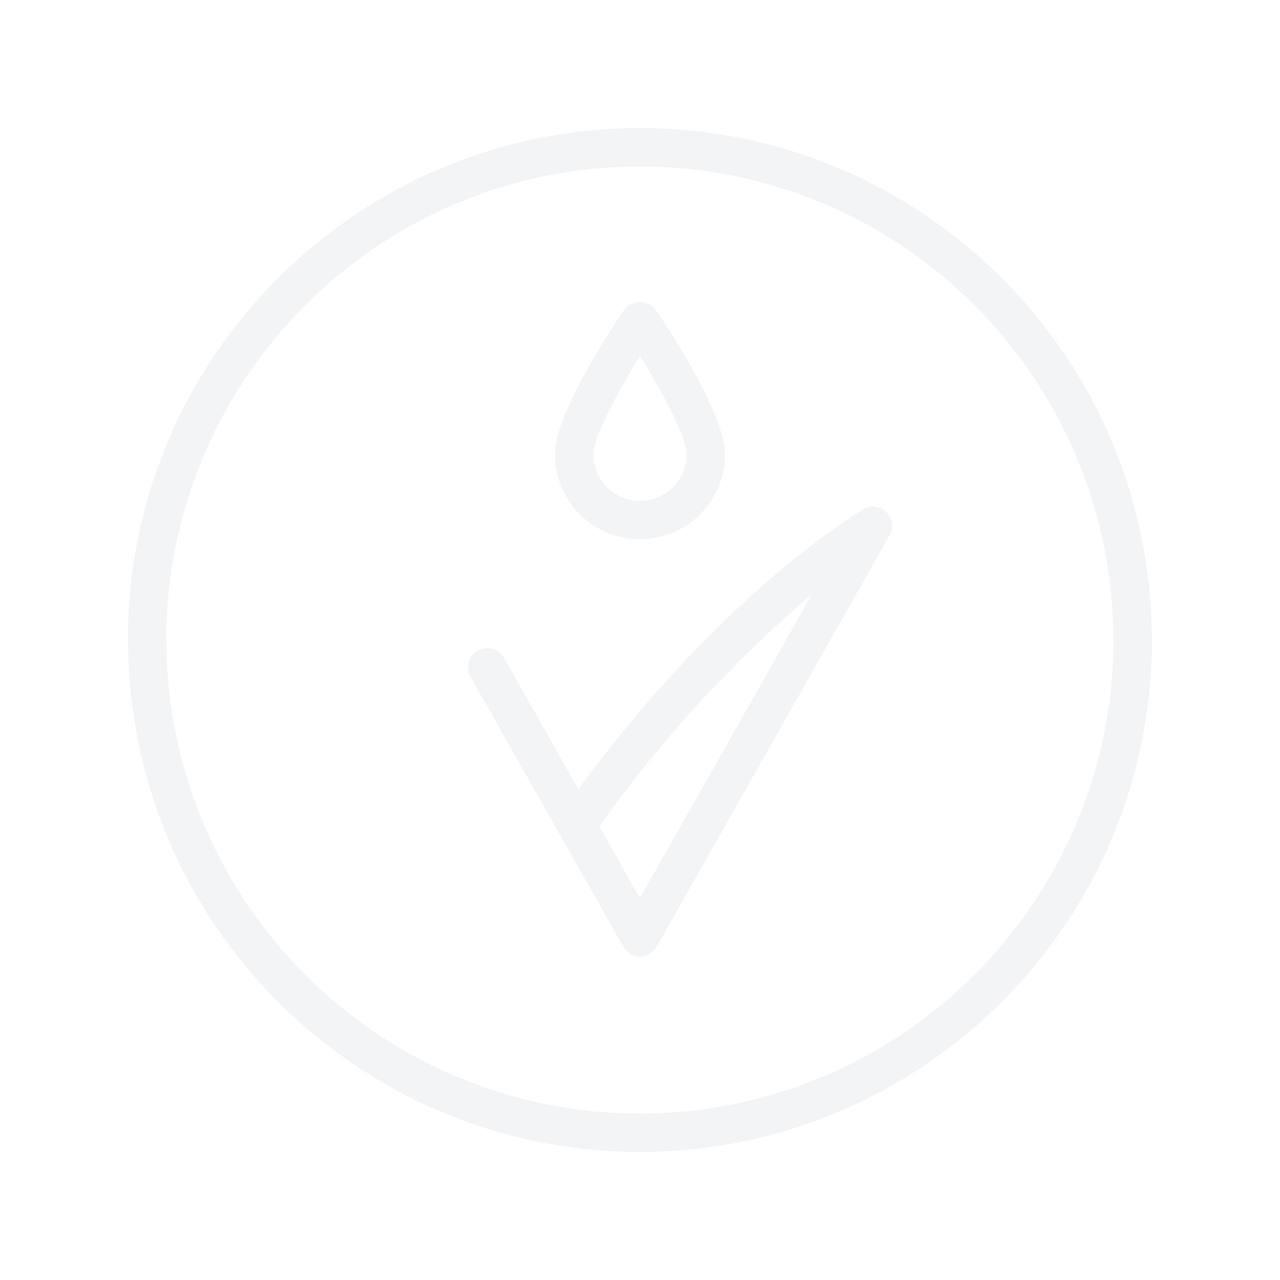 TONYMOLY Intense Care Snail Hydro-Gel Mask 25g